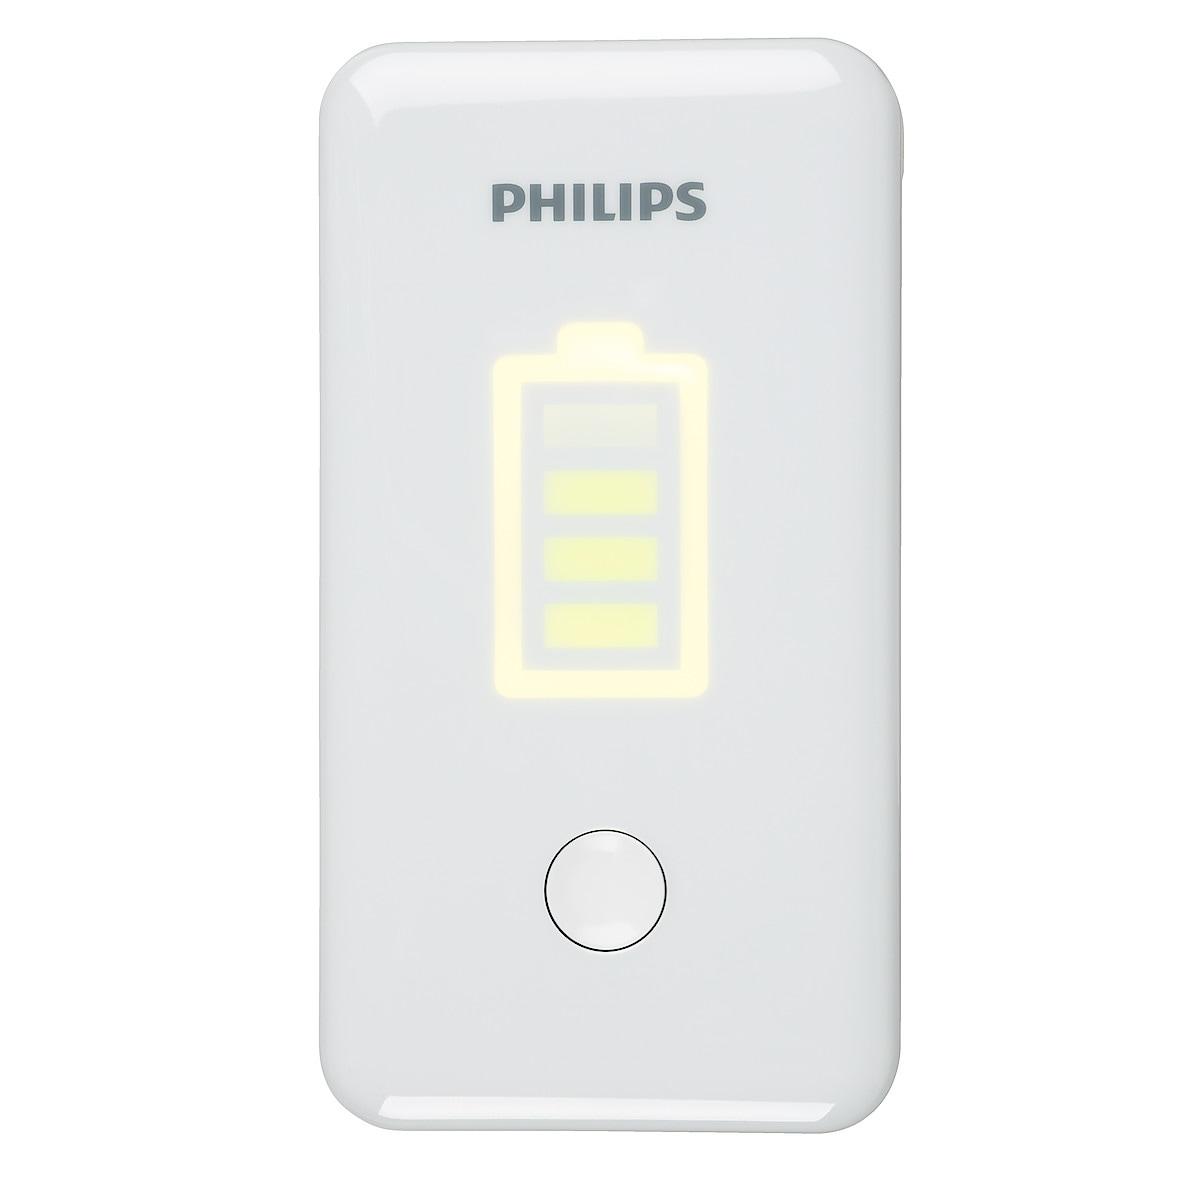 USB-yleisakku Philips DLM2262